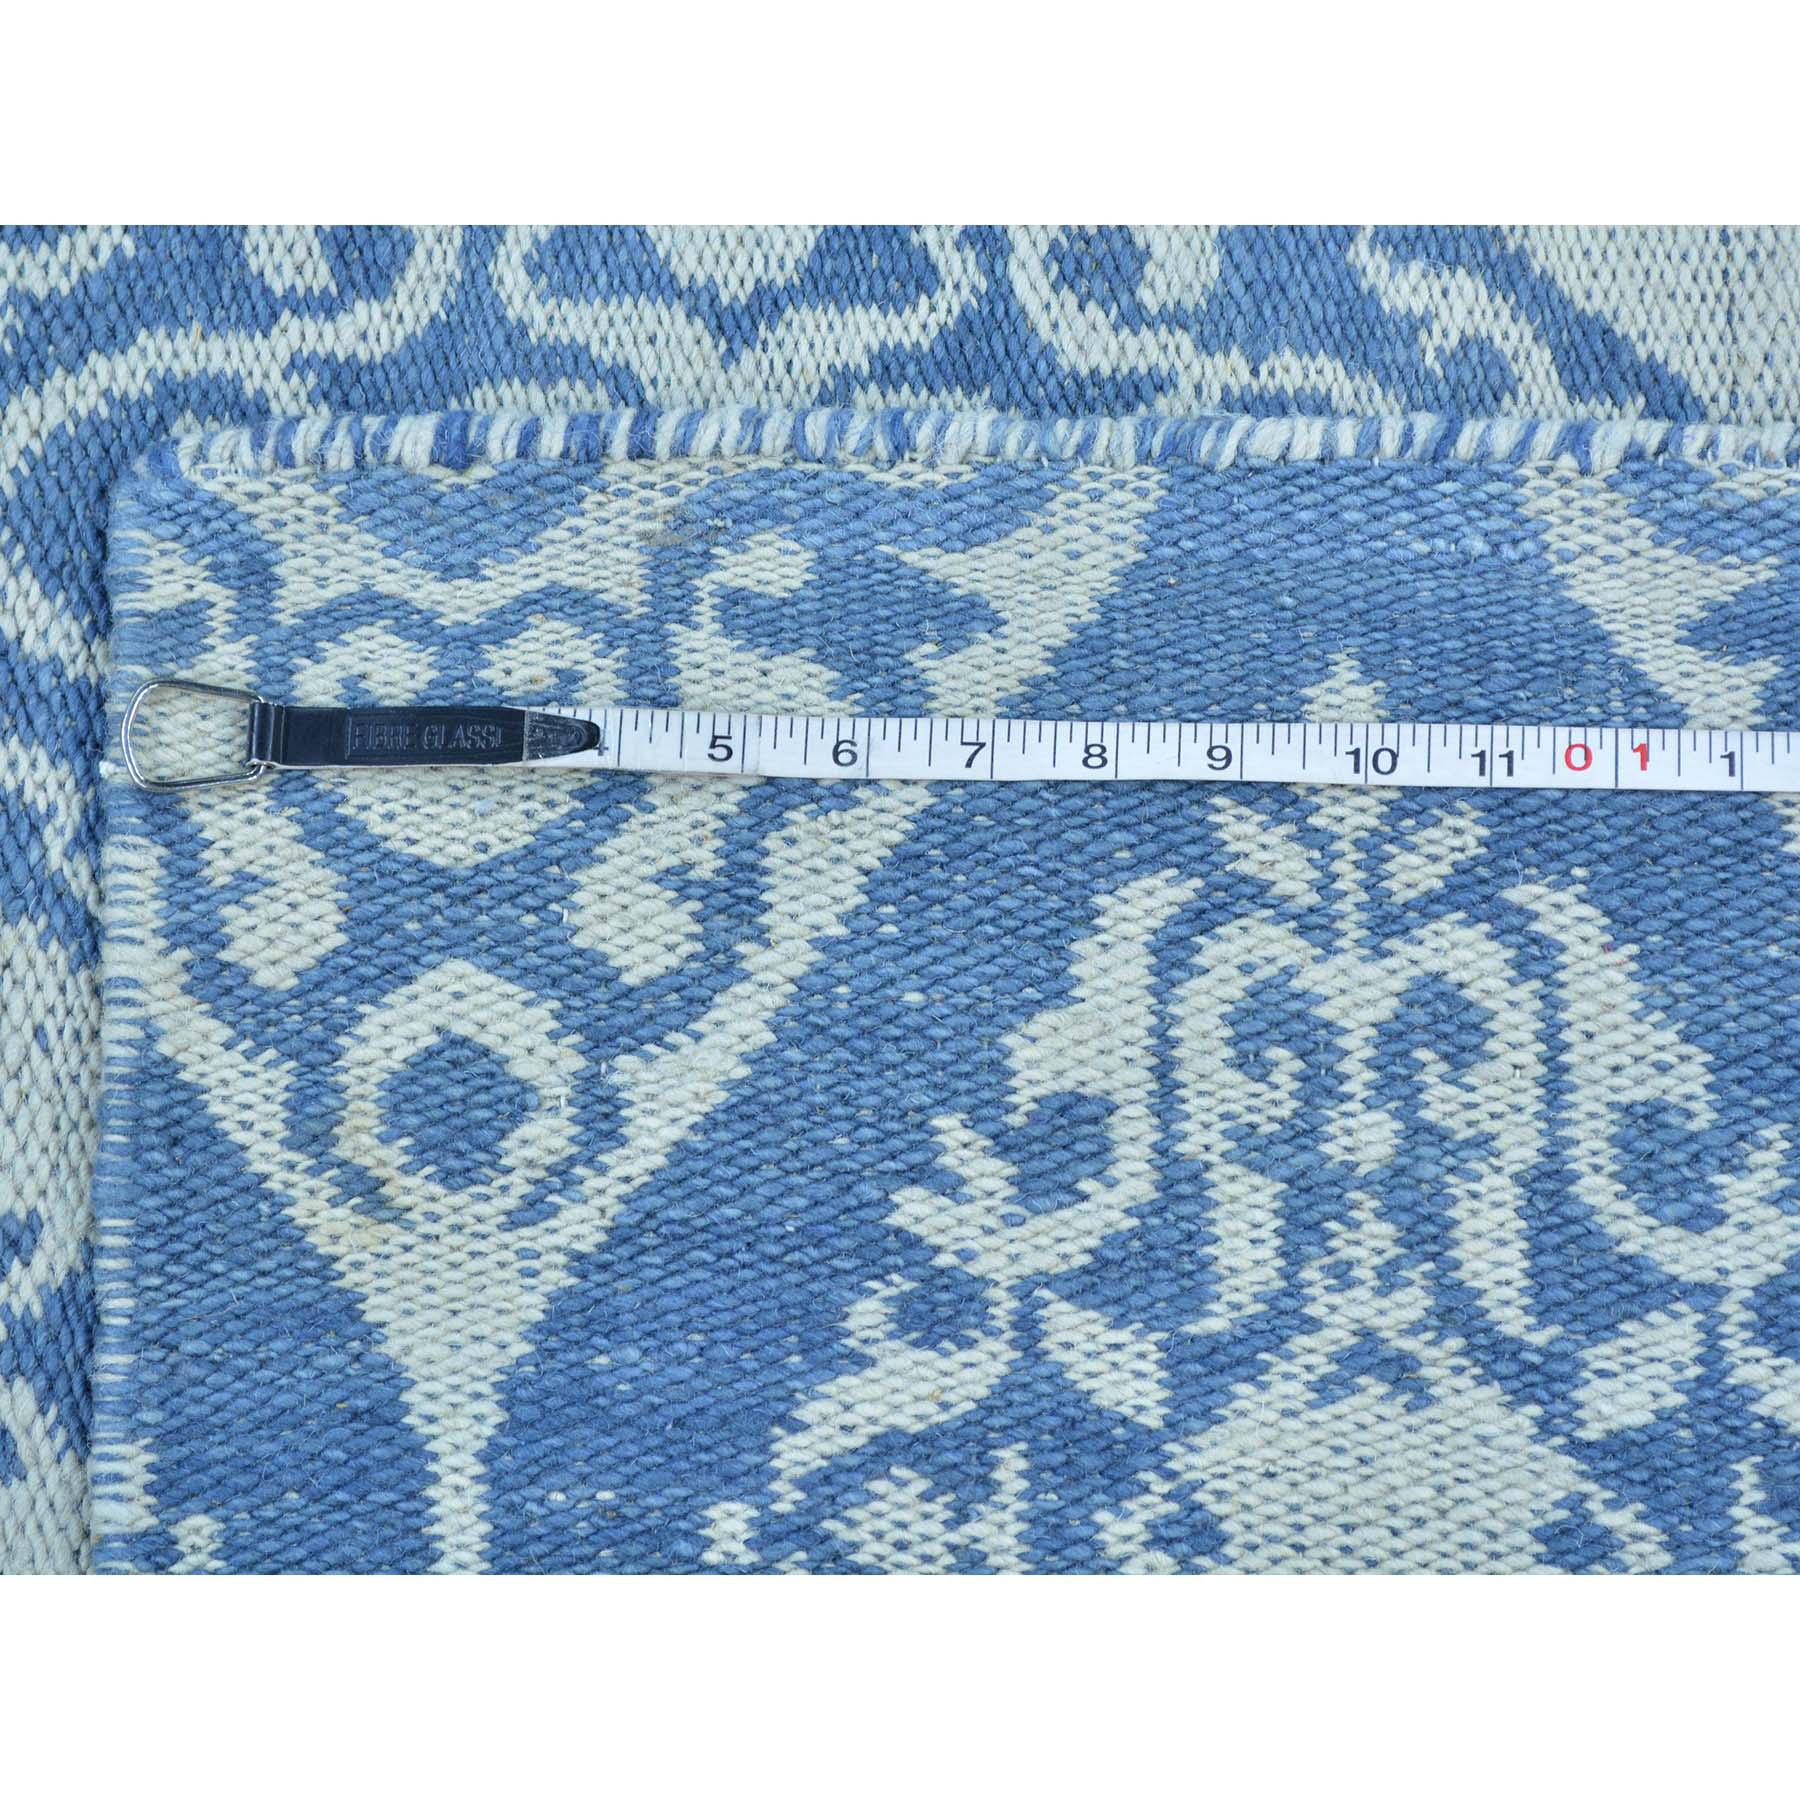 5-2 x6-10  Flat Weave Hand Woven Reversible Kilim Oriental Rug